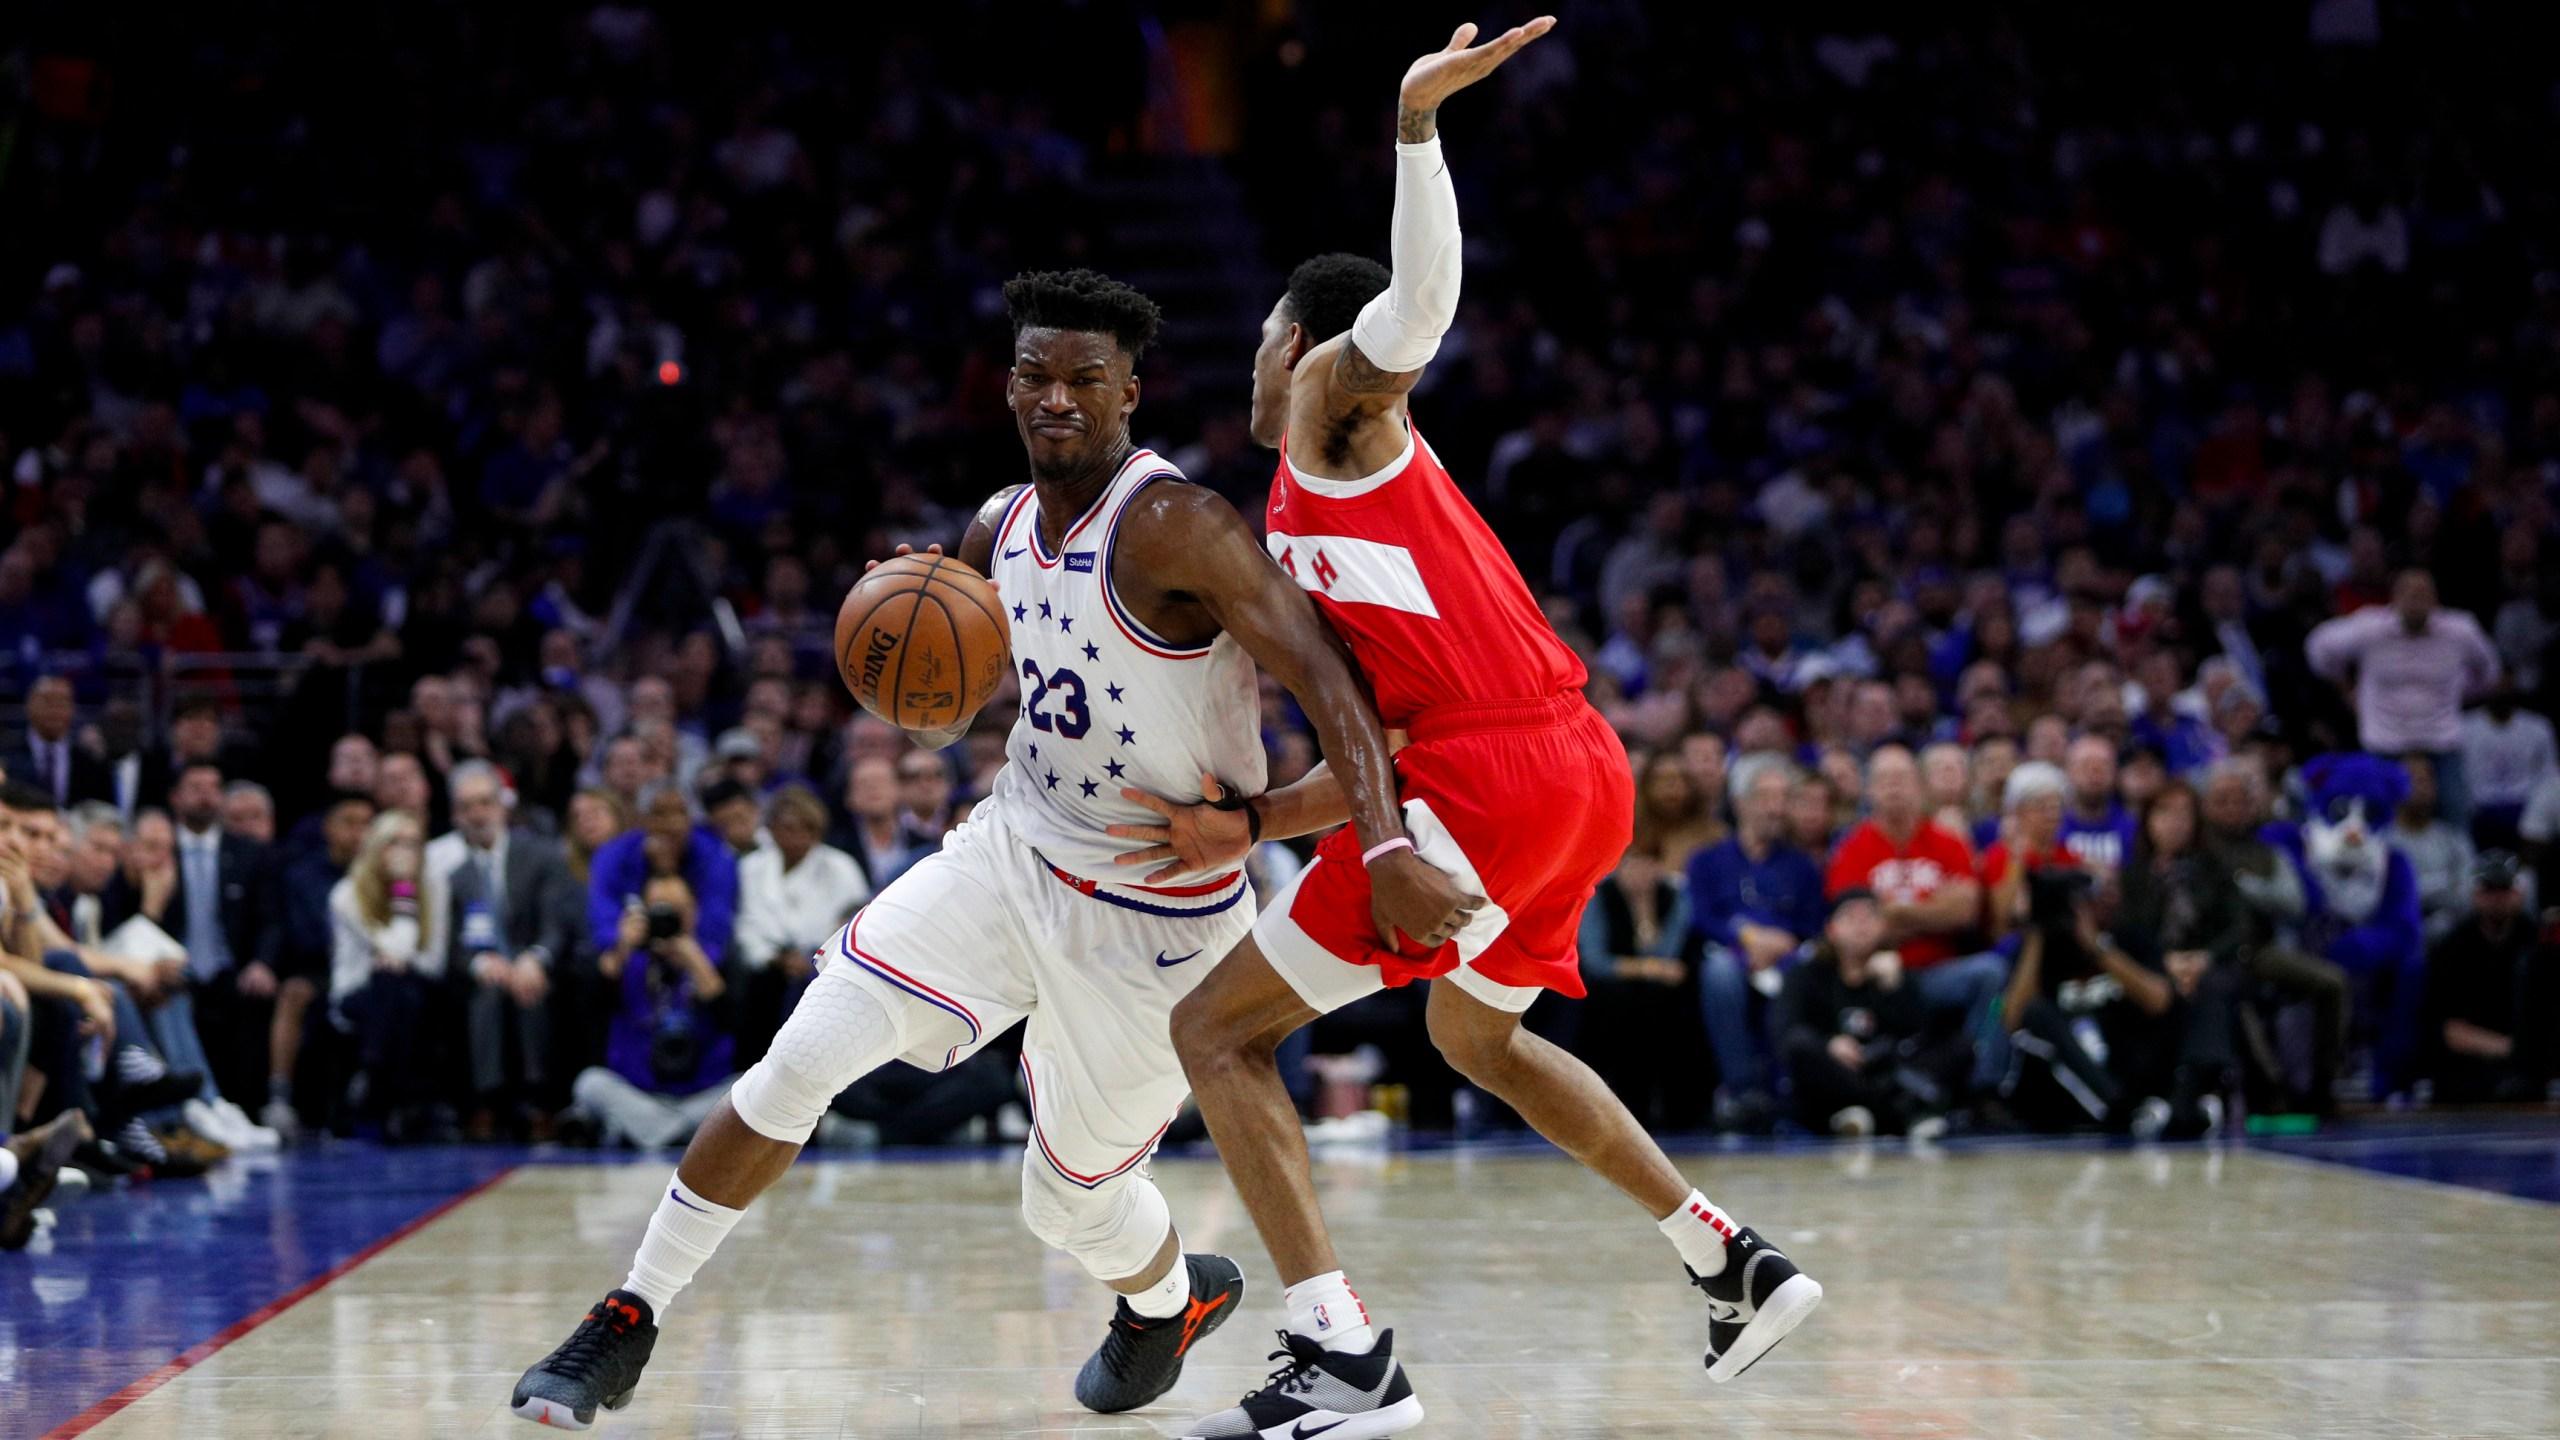 Raptors 76ers Basketball_1557512740729